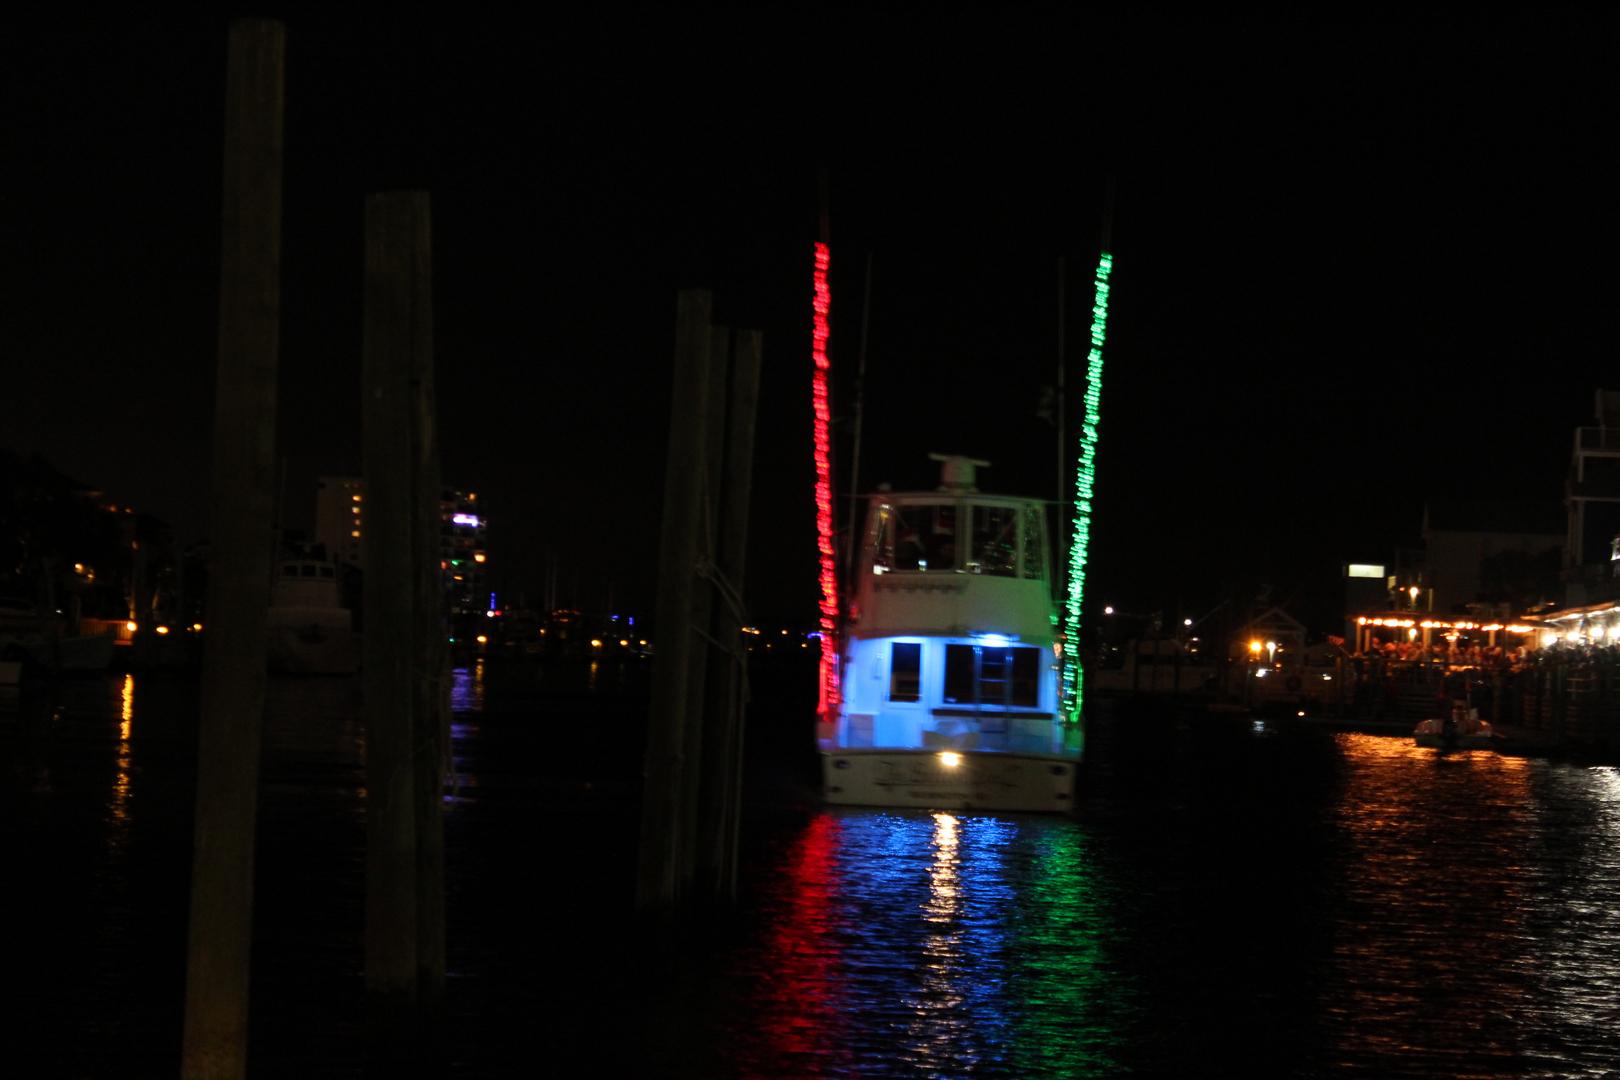 Washington Nc Christmas Flotilla 2020 The Christmas Flotilla